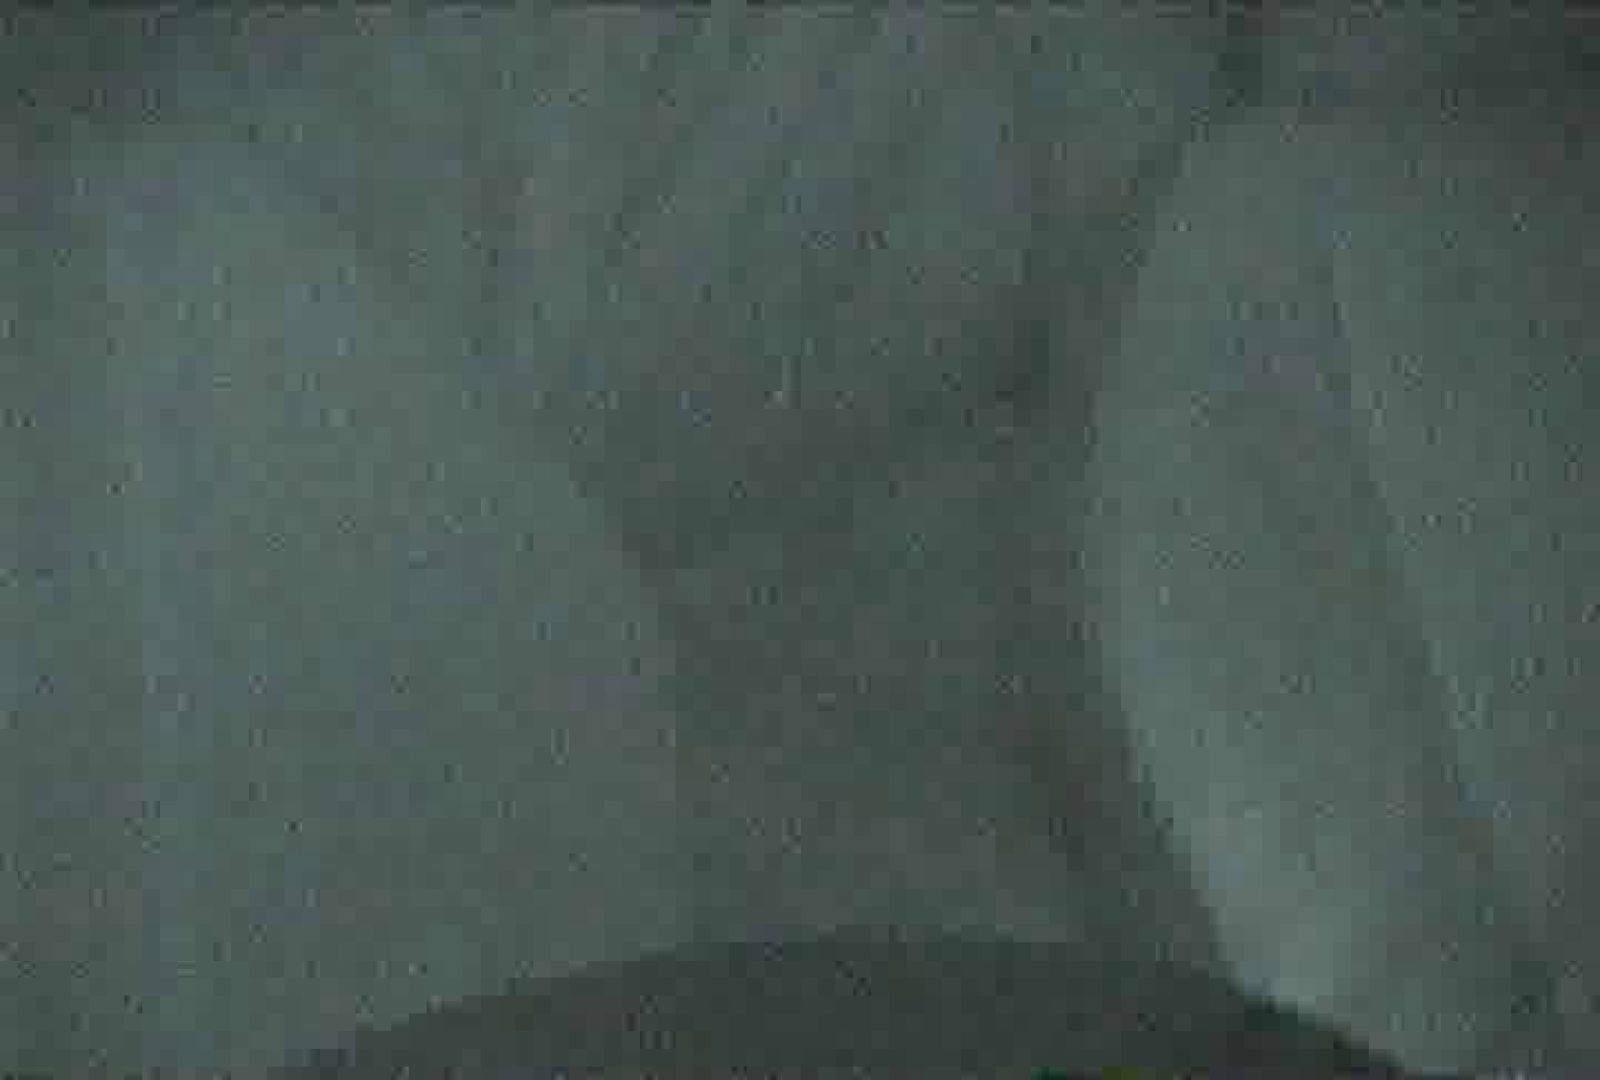 充血監督の深夜の運動会Vol.86 接写 セックス無修正動画無料 98画像 43